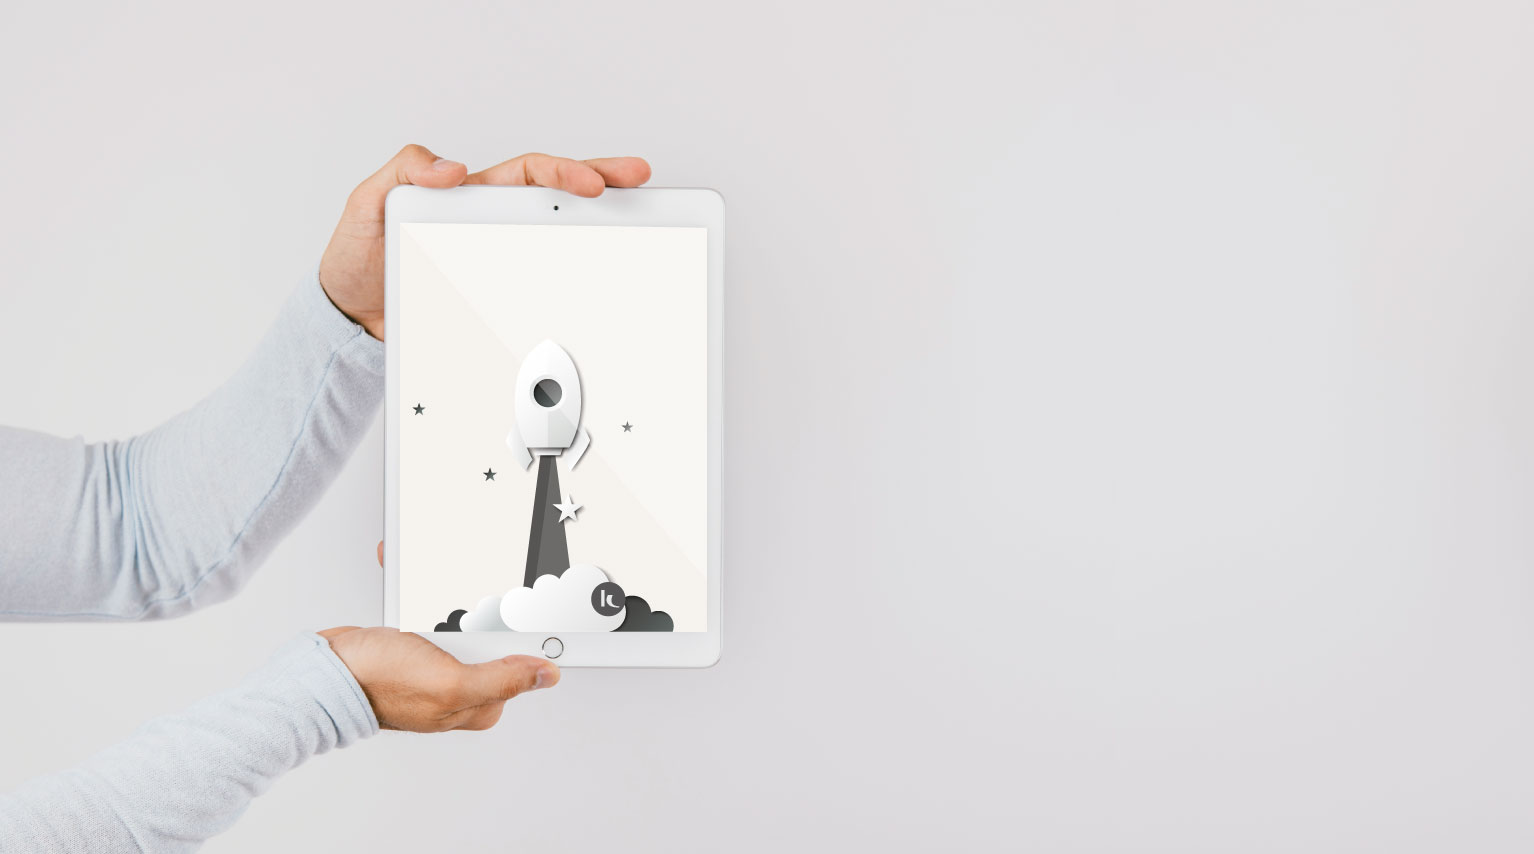 diseno-empresas-soluciones-comunicacion-visual